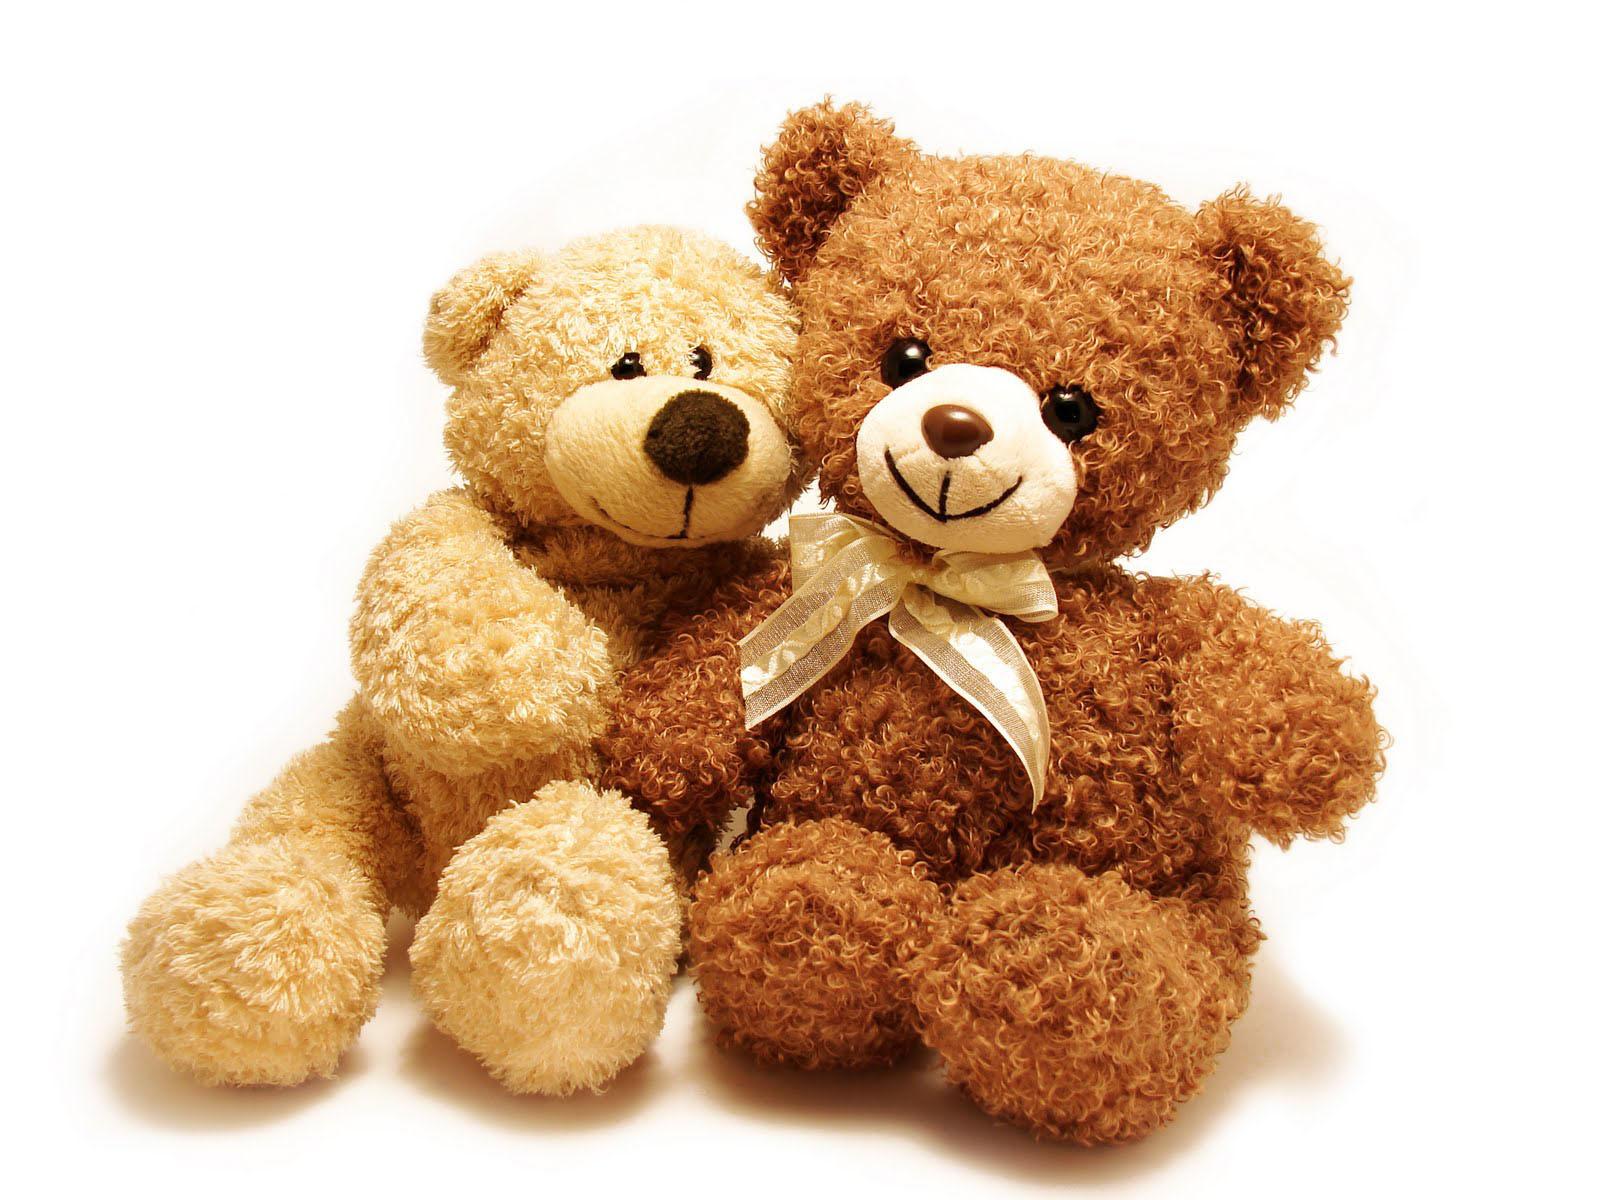 Cute Teddy Bear Wallpaper 1600x1200 pixel Popular HD Wallpaper 1600x1200